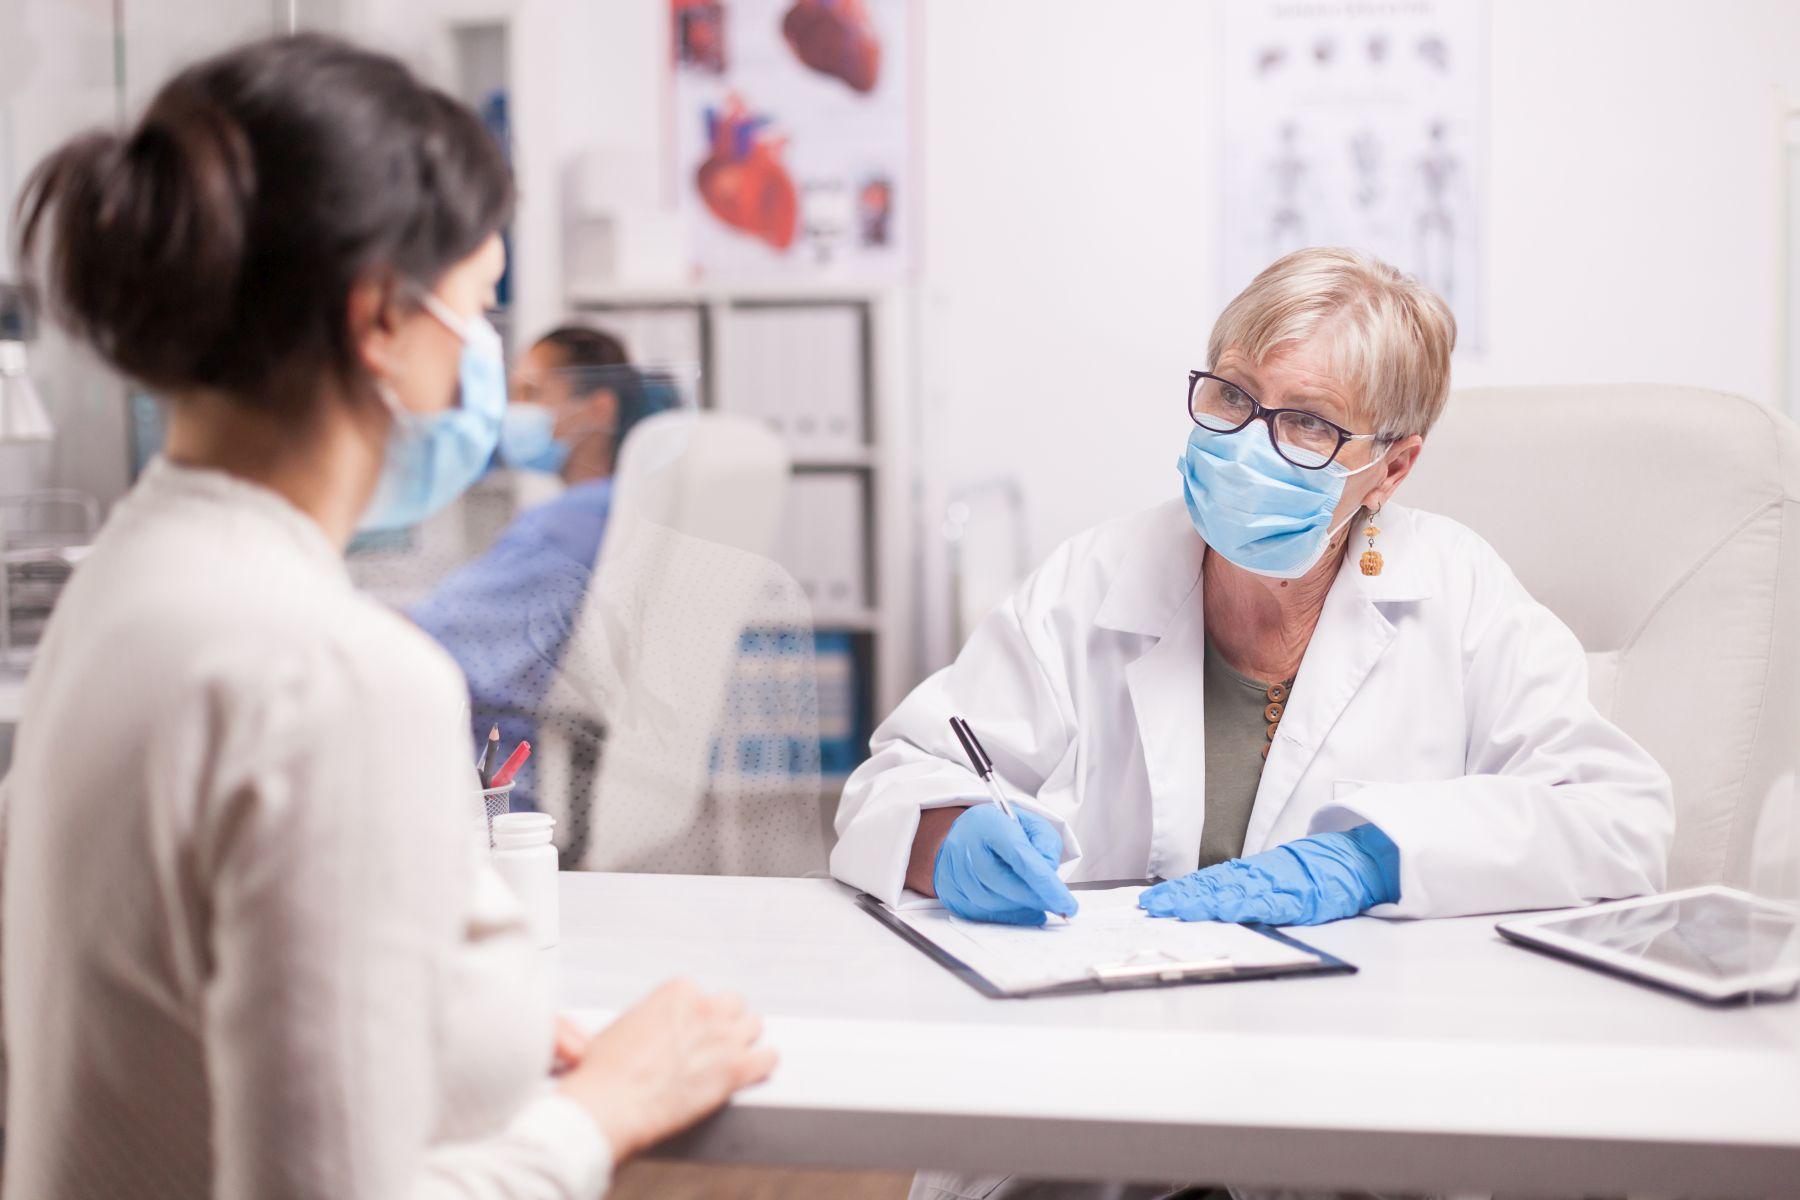 atrair pacientes